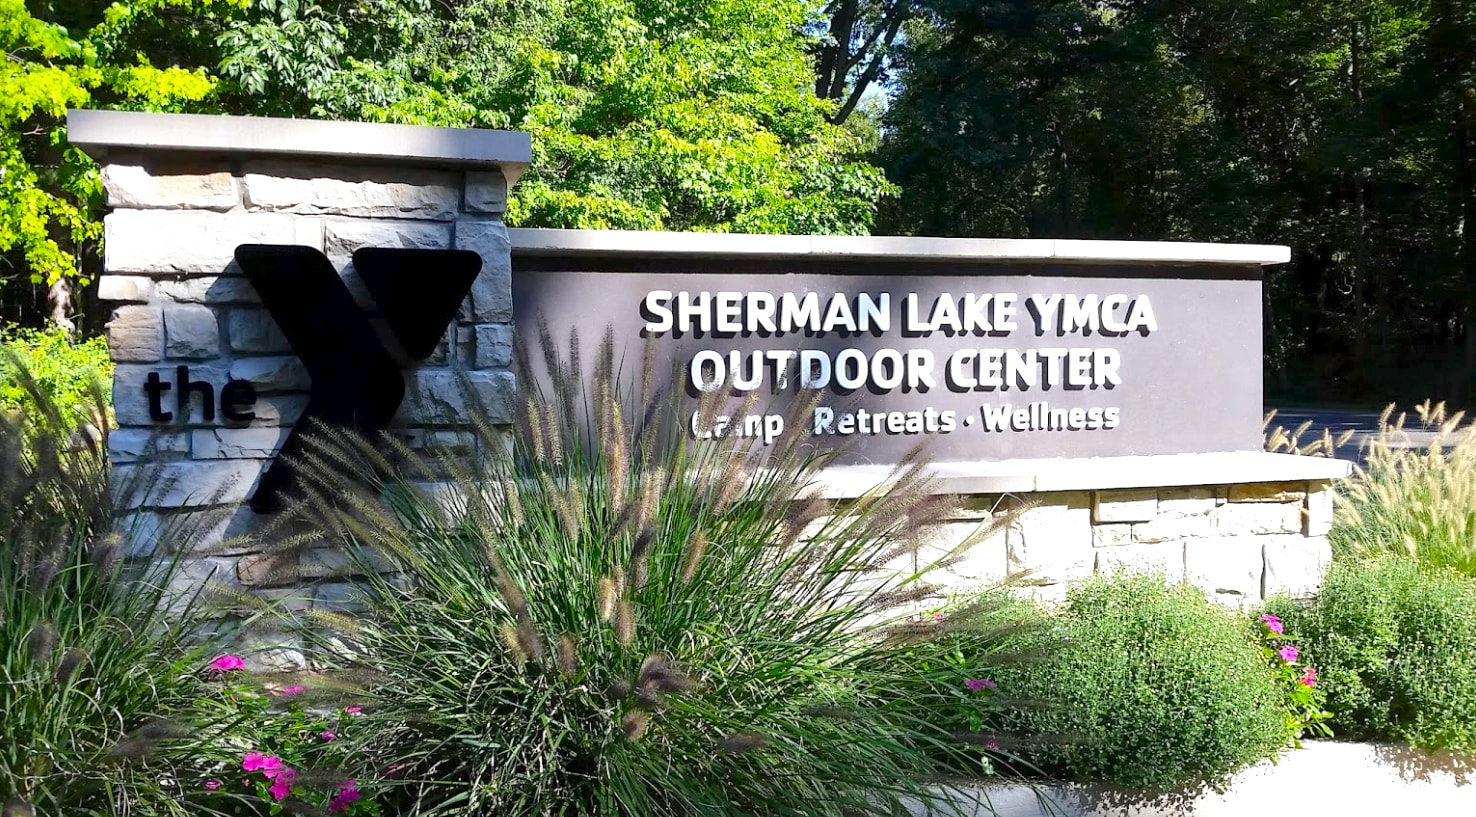 Zeigler Donates ATV to Sherman Lake YMCA